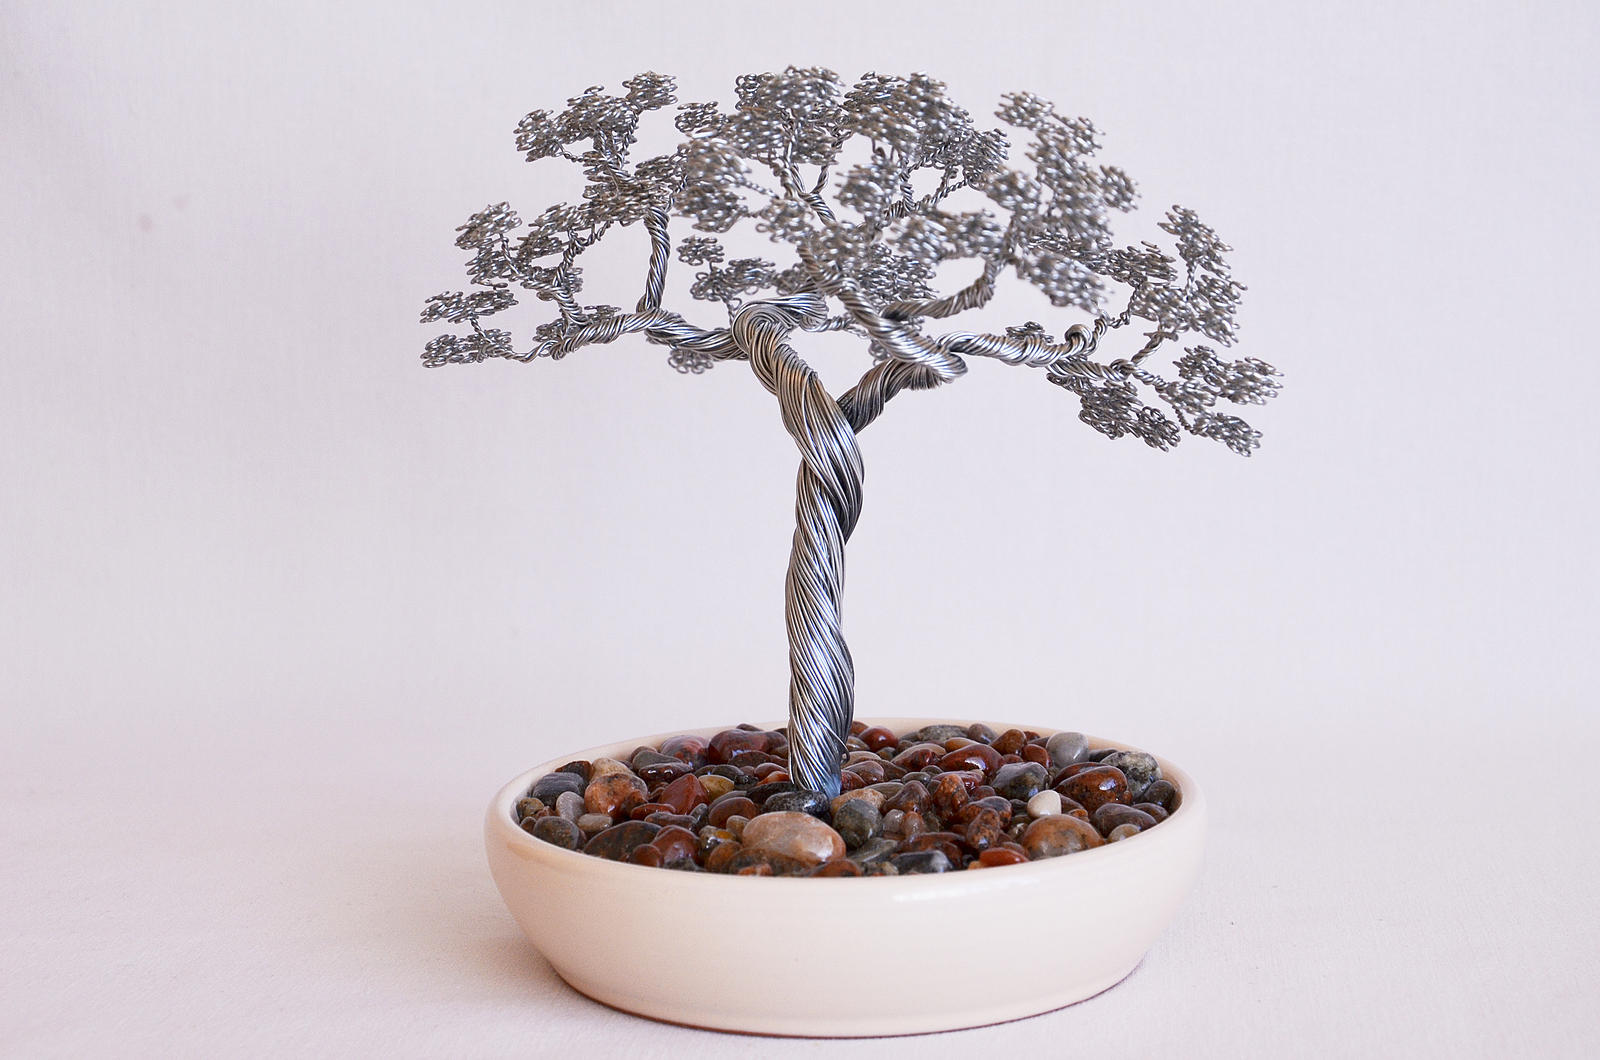 Bonsai Wire Sculpture | S Wire Sculpture Lessons Tes Teach